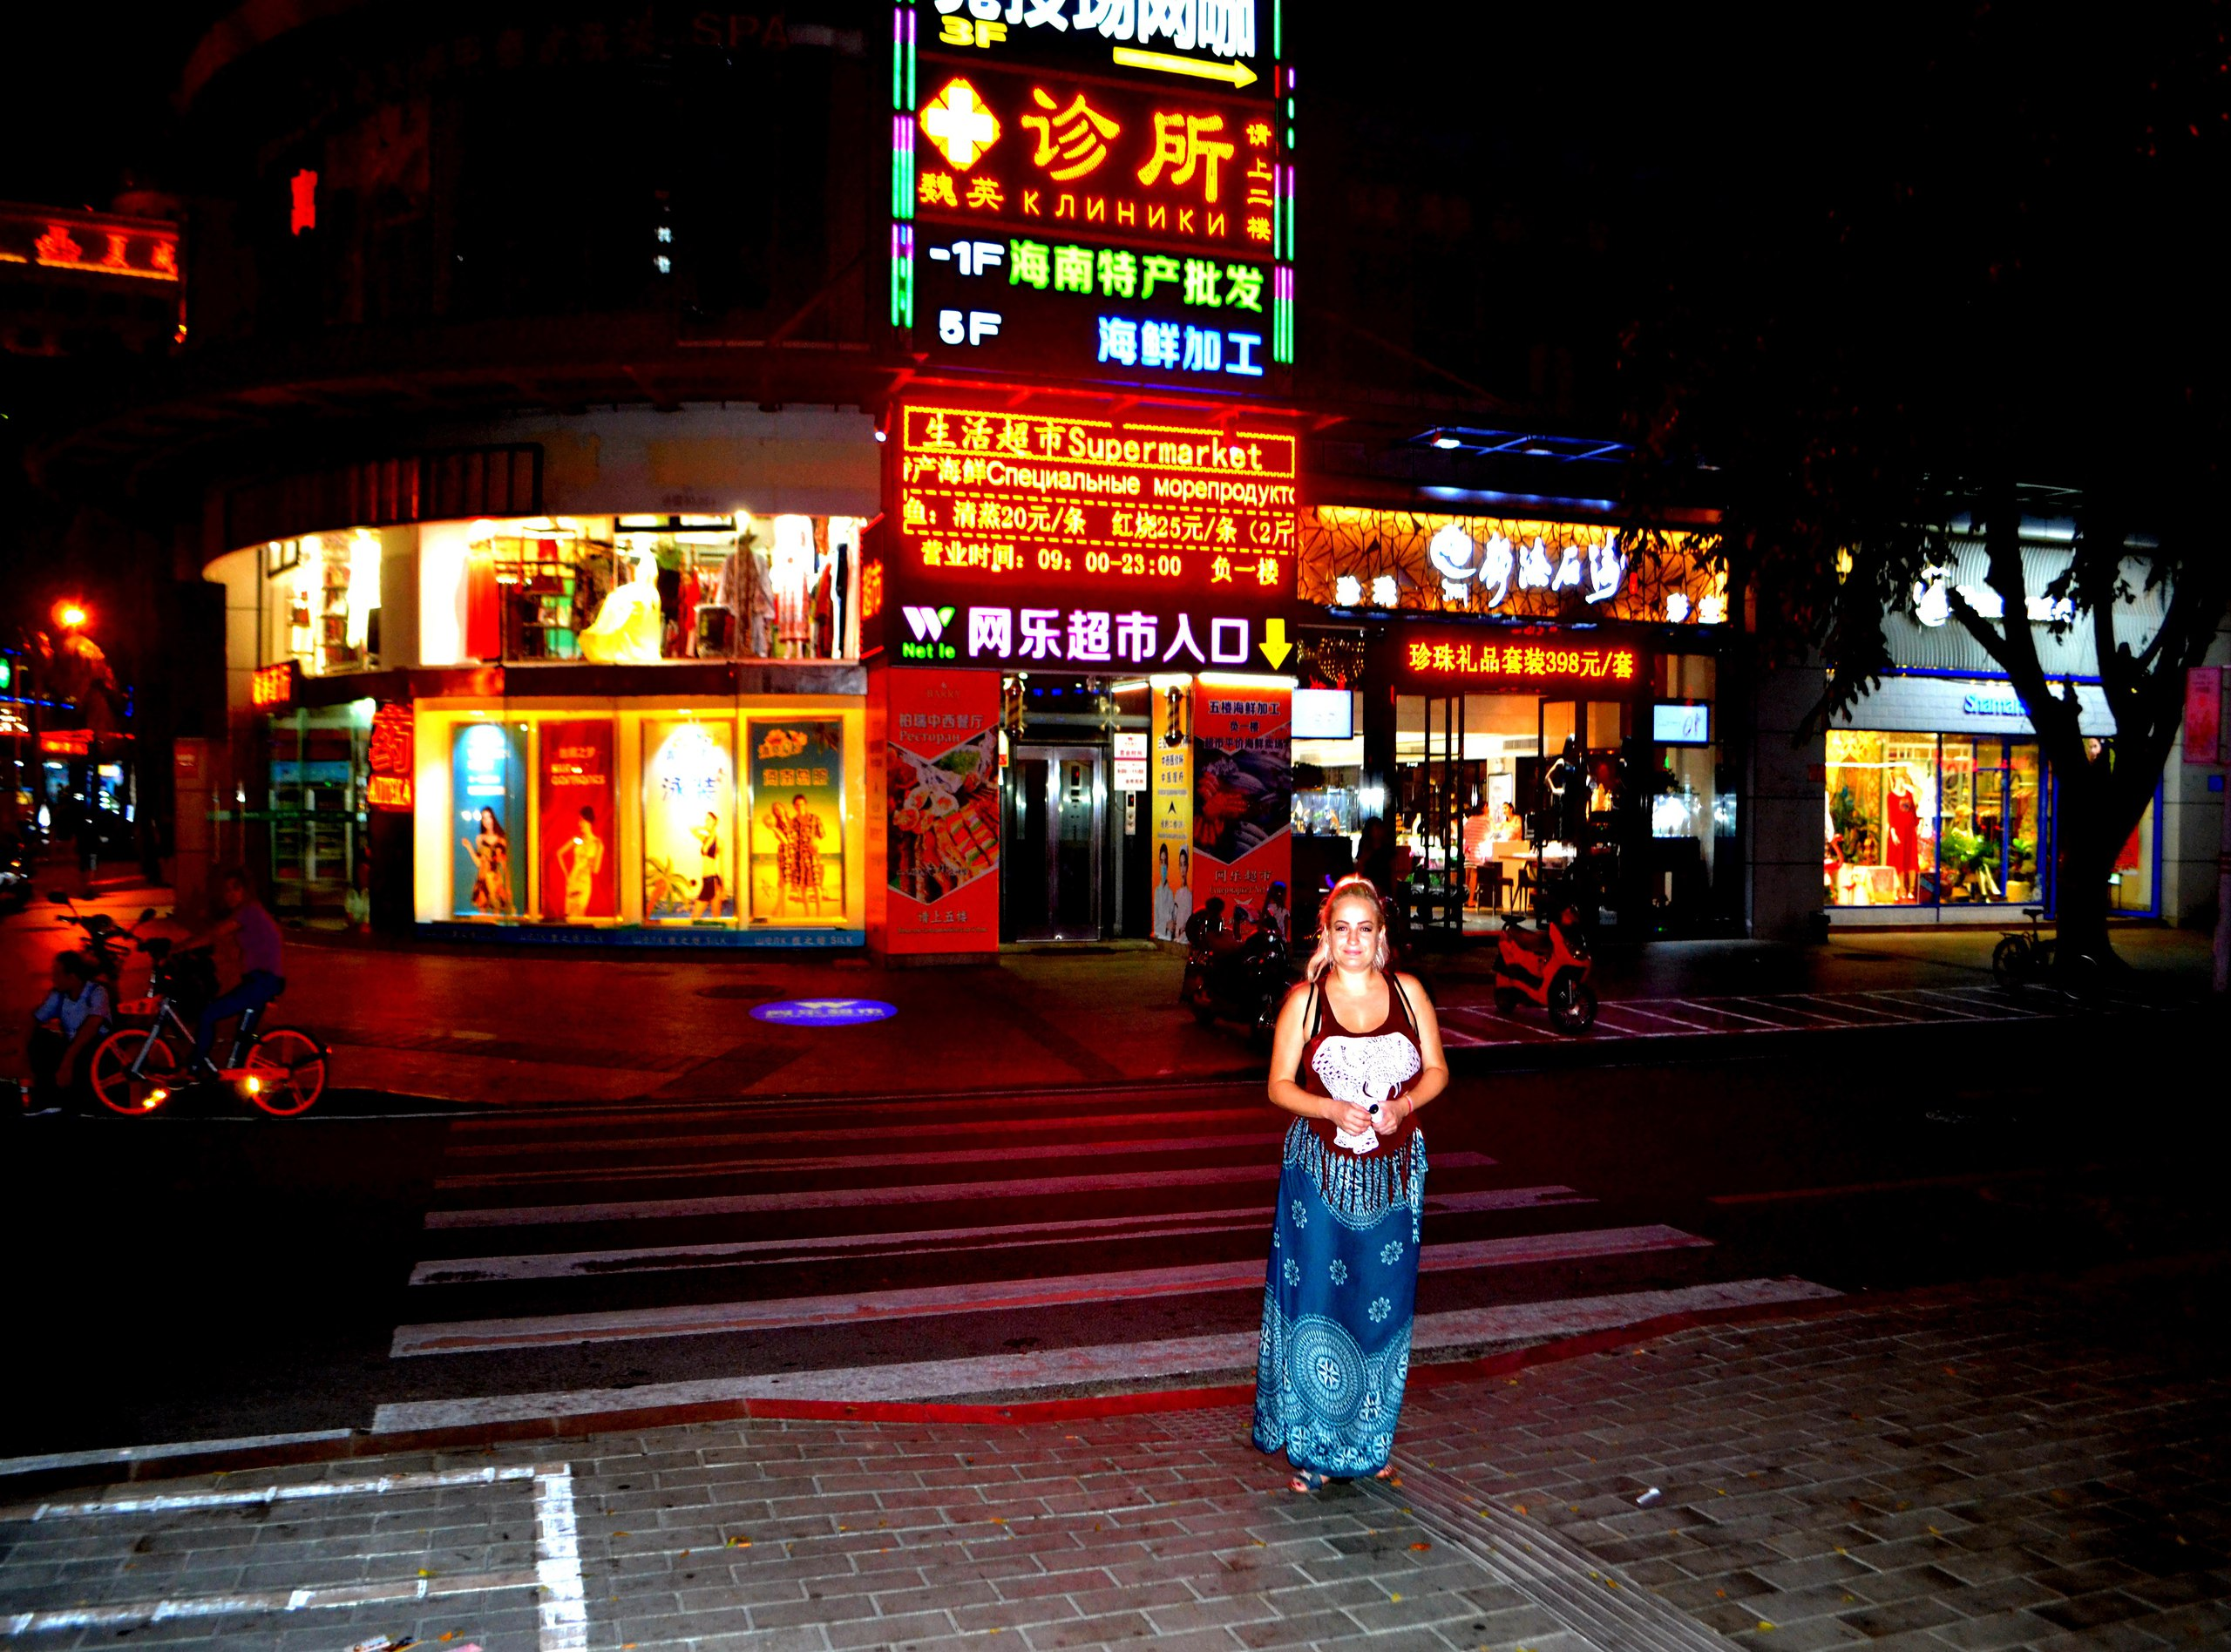 Елена Руденко (Валтея). Китай, о.Хайнань, г.Санья. (фото) - Страница 2 VlWJG8xV4CA